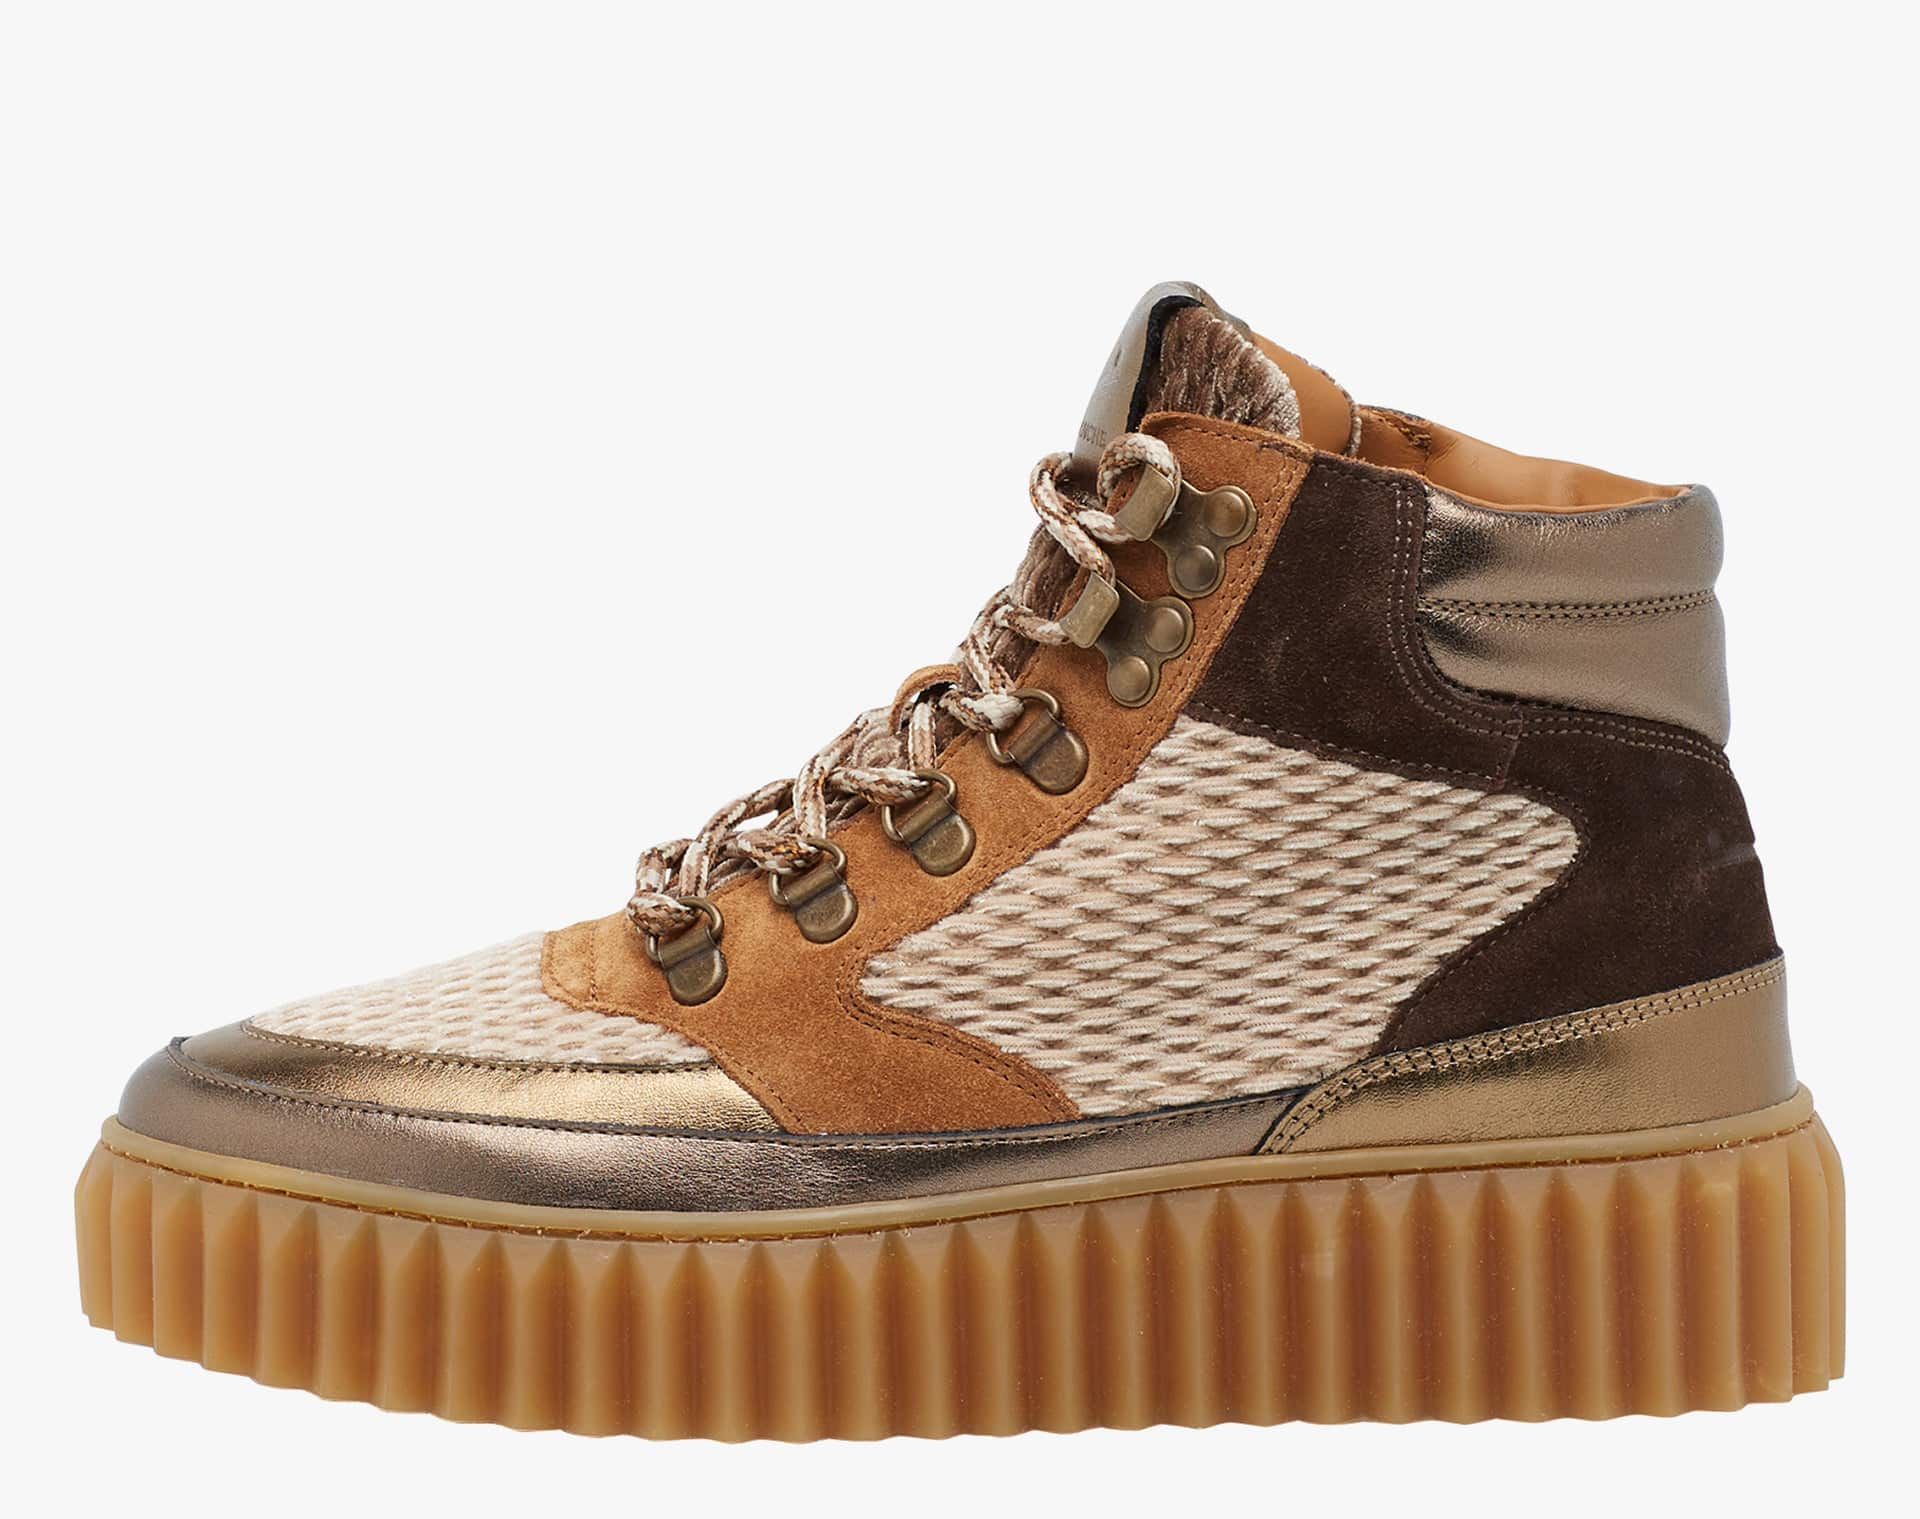 EVA HIKE - Ankle boot in velvet and leather - Multicoloured